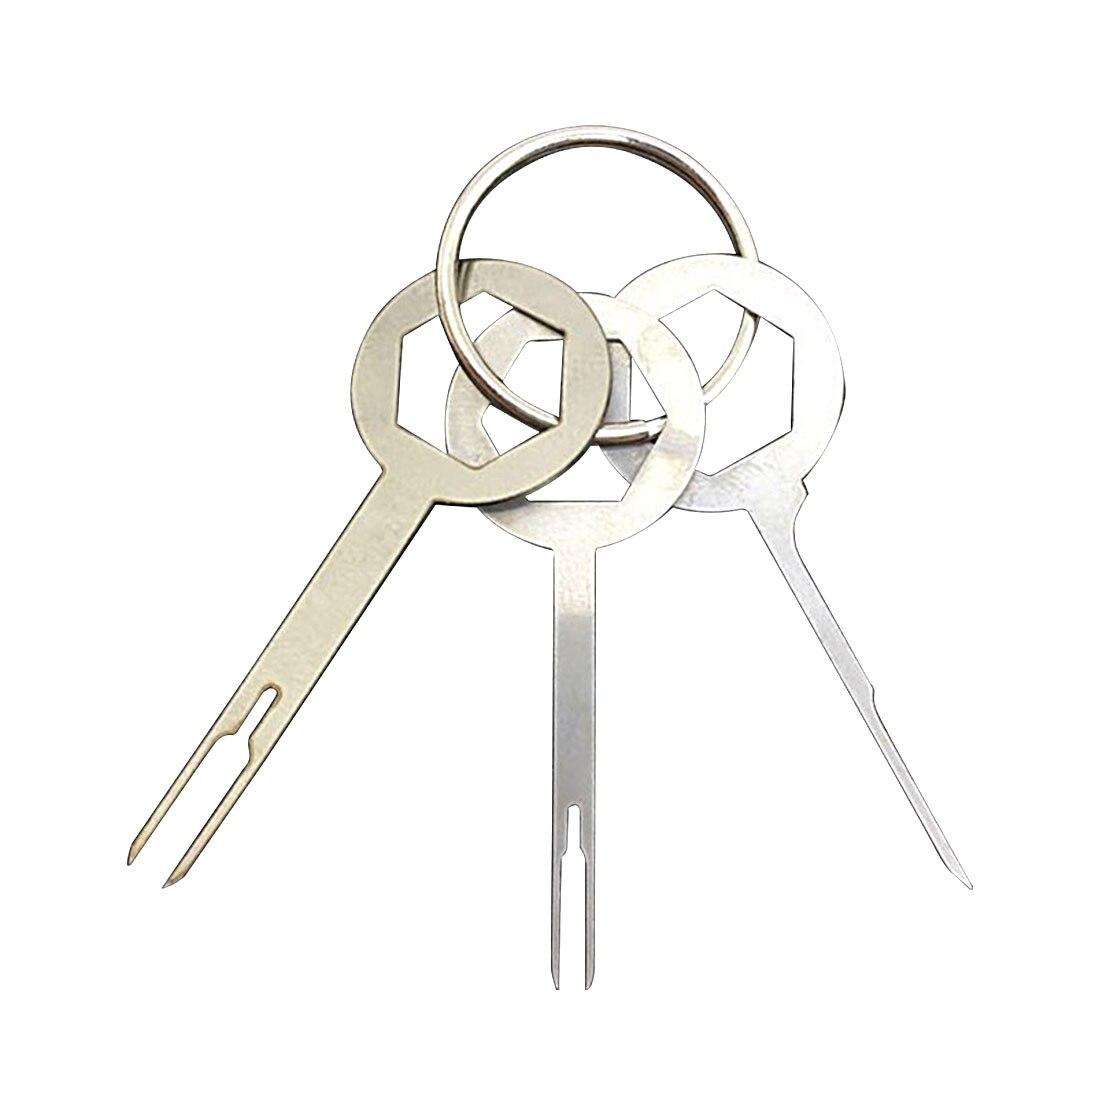 Купить с кэшбэком 11Pcs/Set Terminal Removal Tools Car Electrical Wiring Crimp Connector Pin Extractor Kit Car Repair Hand Tool Set Plug key CY982